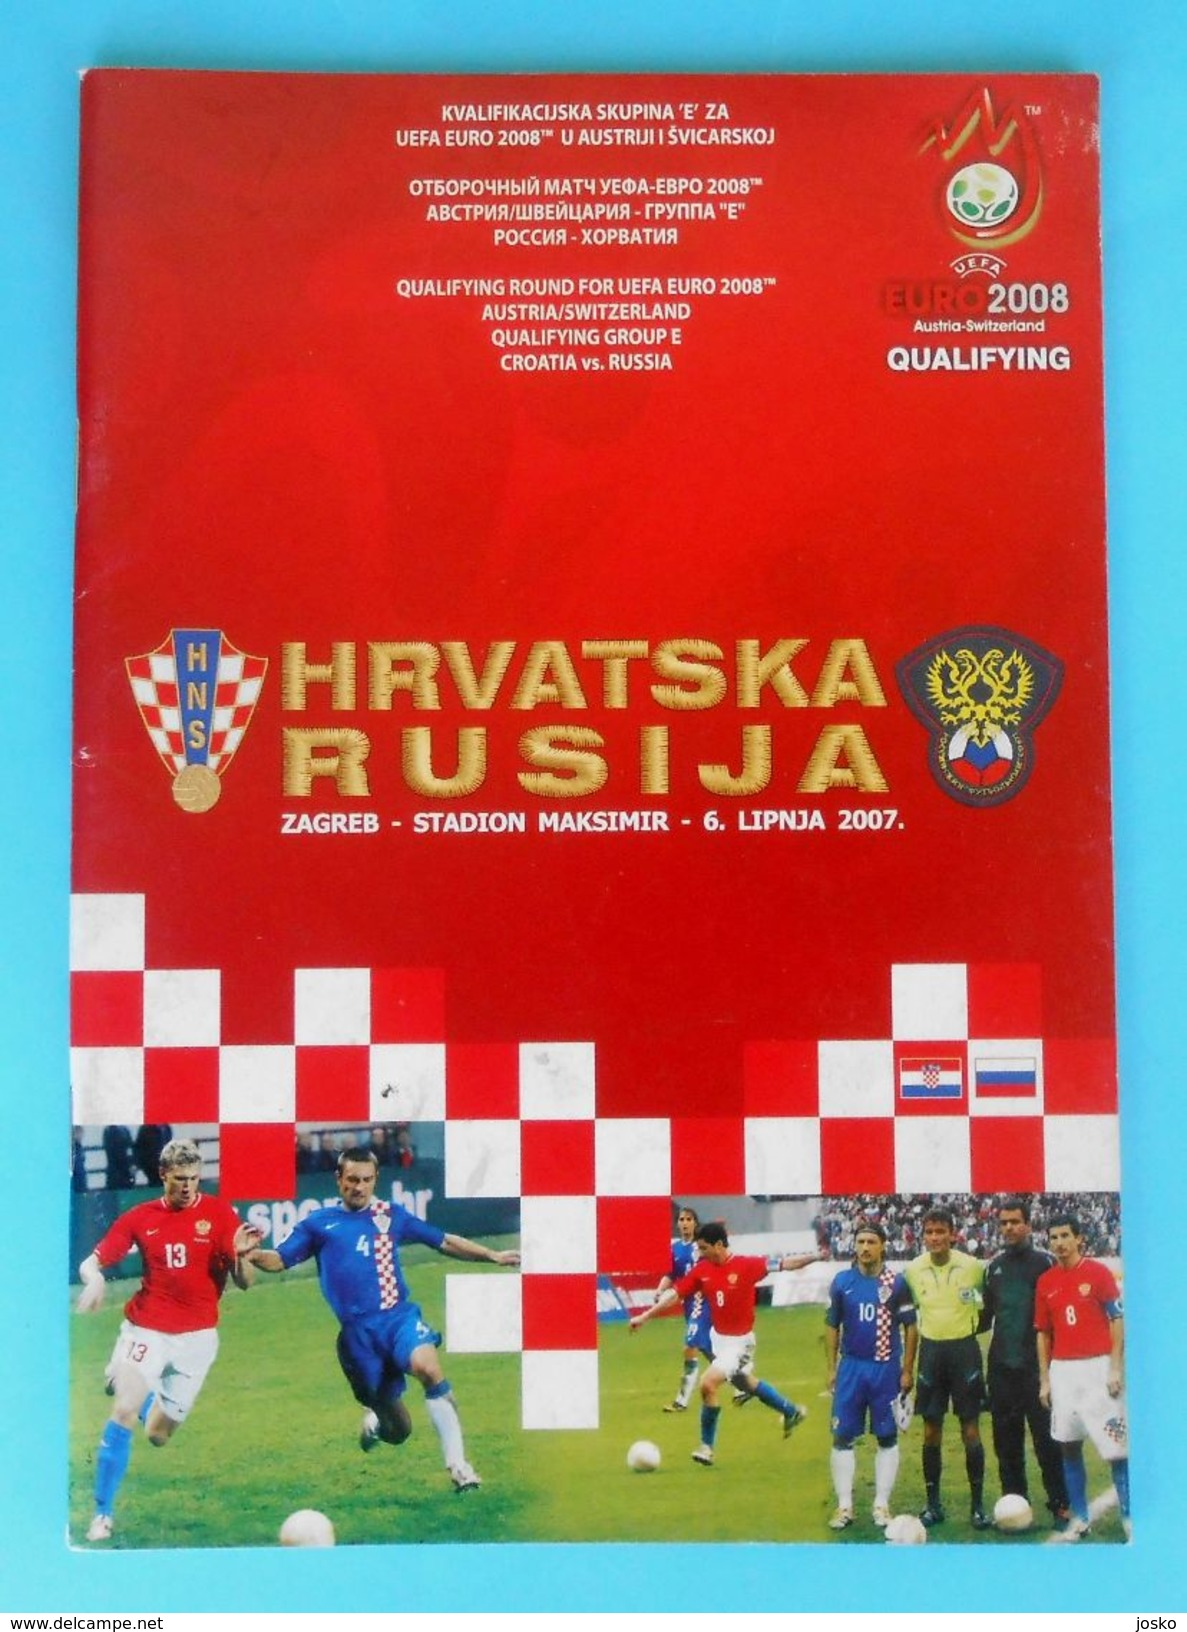 CROATIA : RUSSIA - 2007. Football Match Programme Soccer Fussball Programm Programma Programa Kroatien Croatie Croazia - Match Tickets